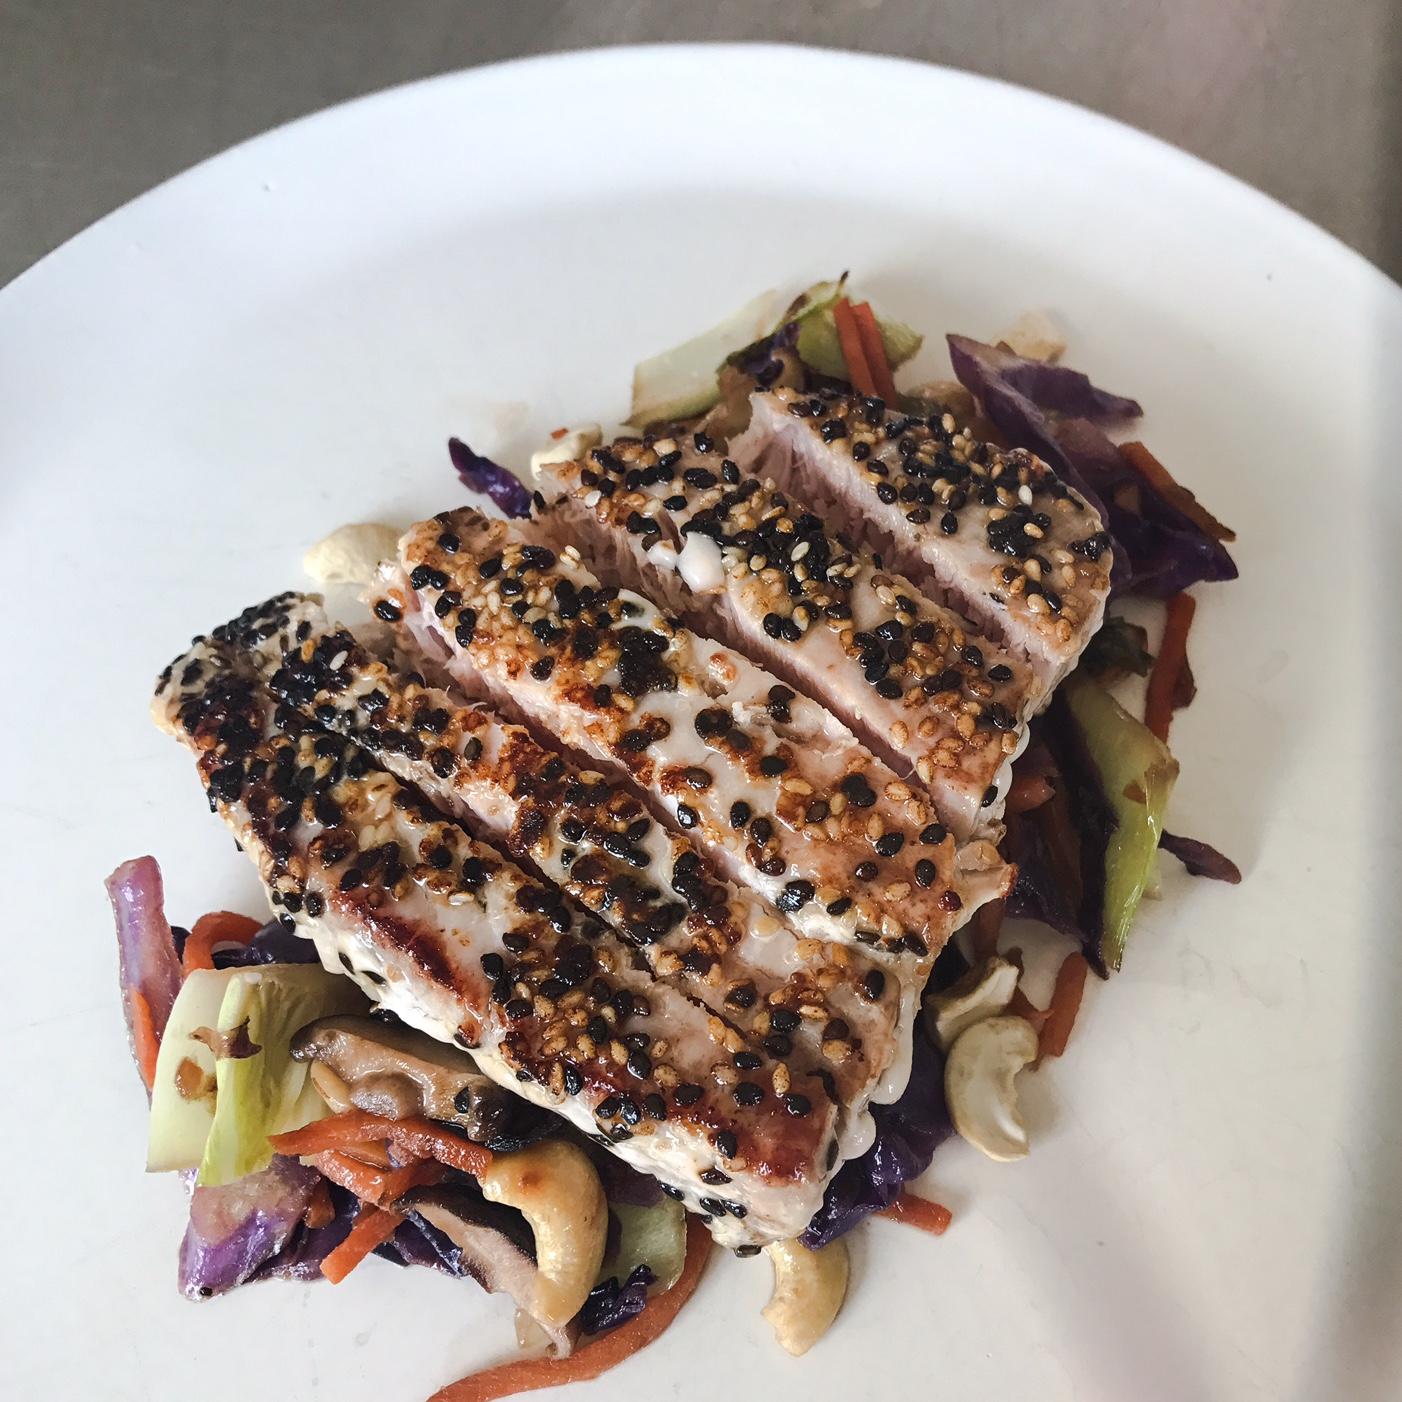 Green Chef's Keto Meal Kit: Sesame-Crusted Tuna